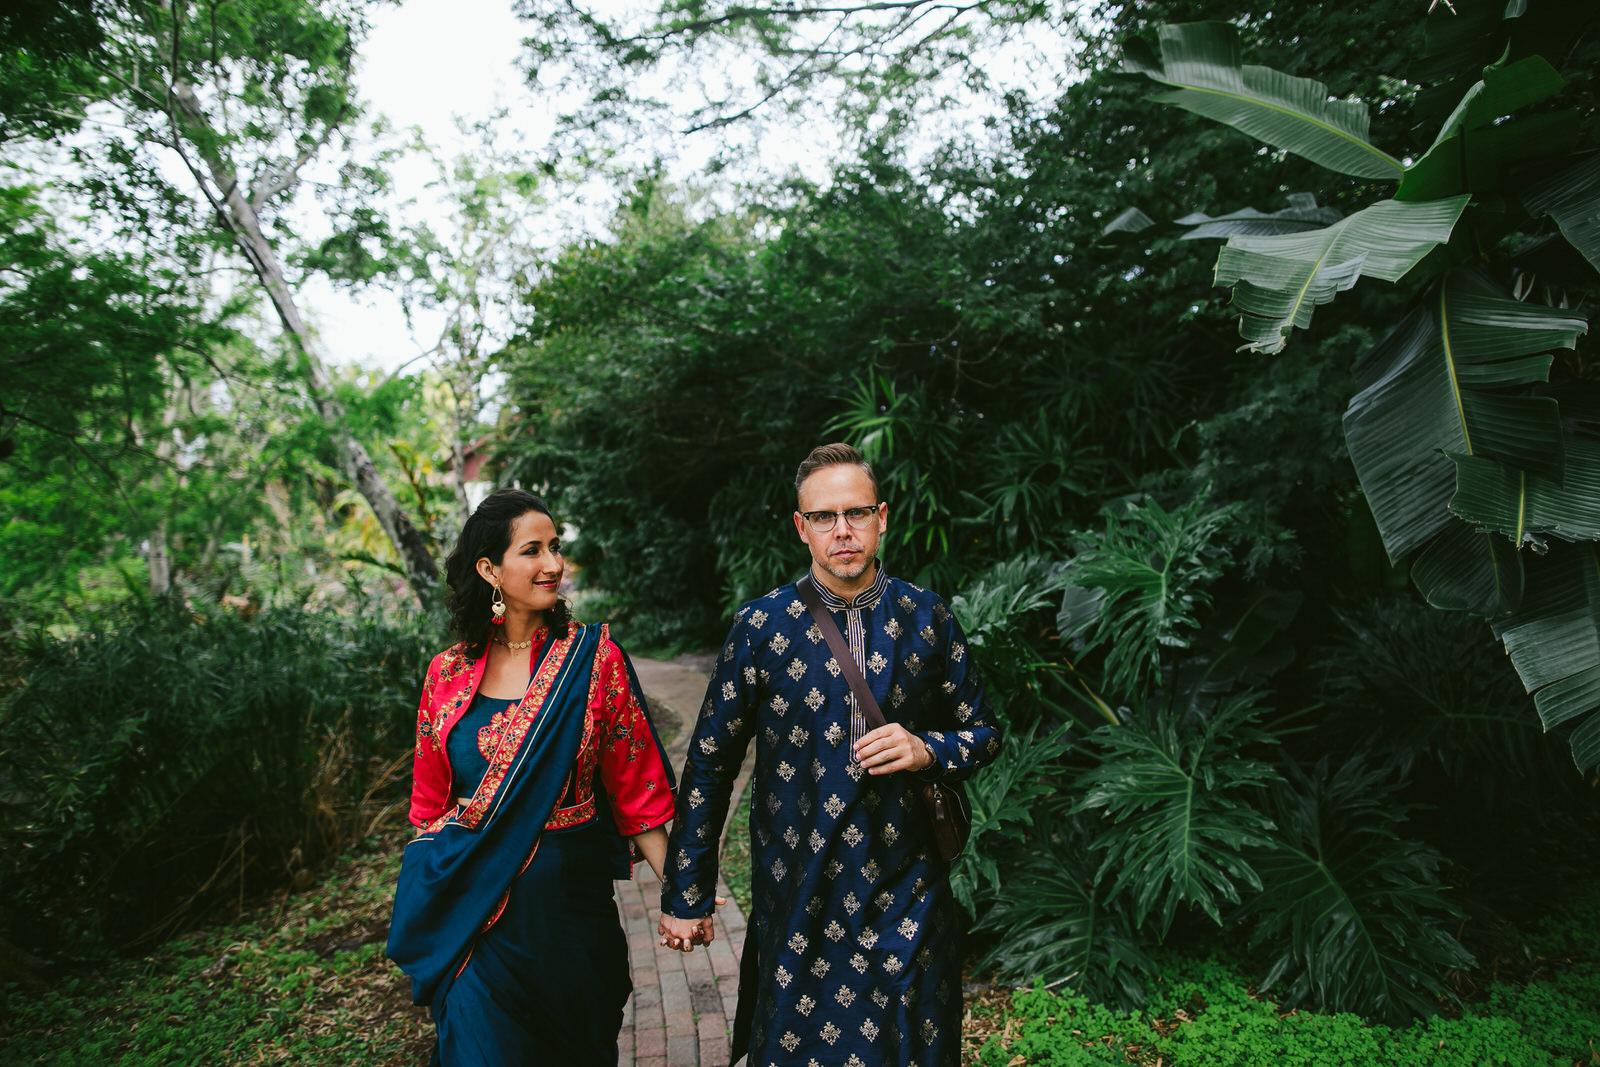 kashi-couple-saris-wedding-weekend-tiny-house-photo